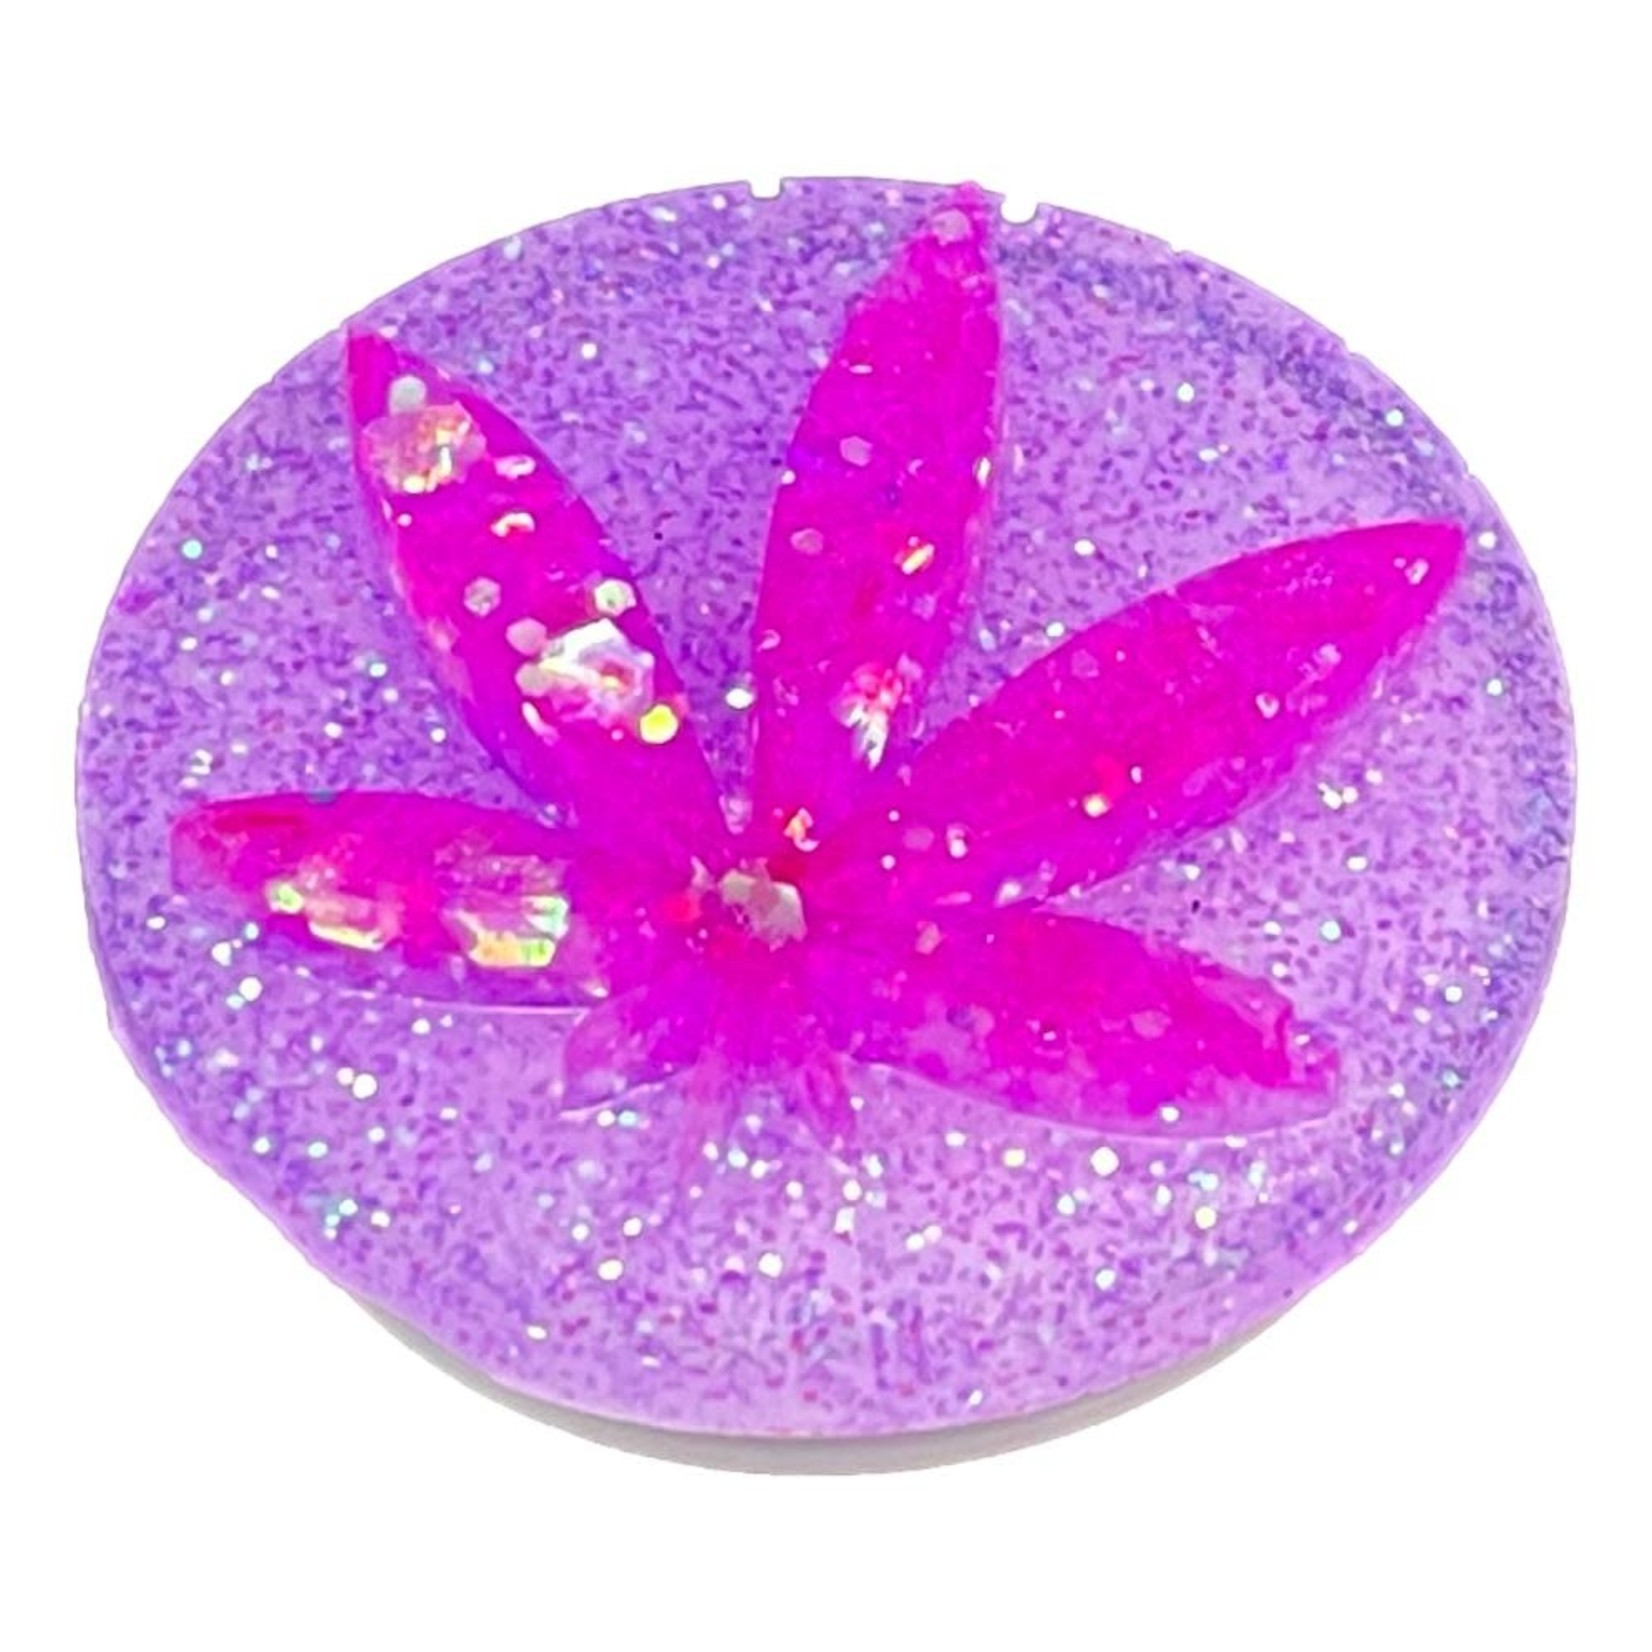 East Coast Sirens Pink on Purple Weed Leaf Phone Grip